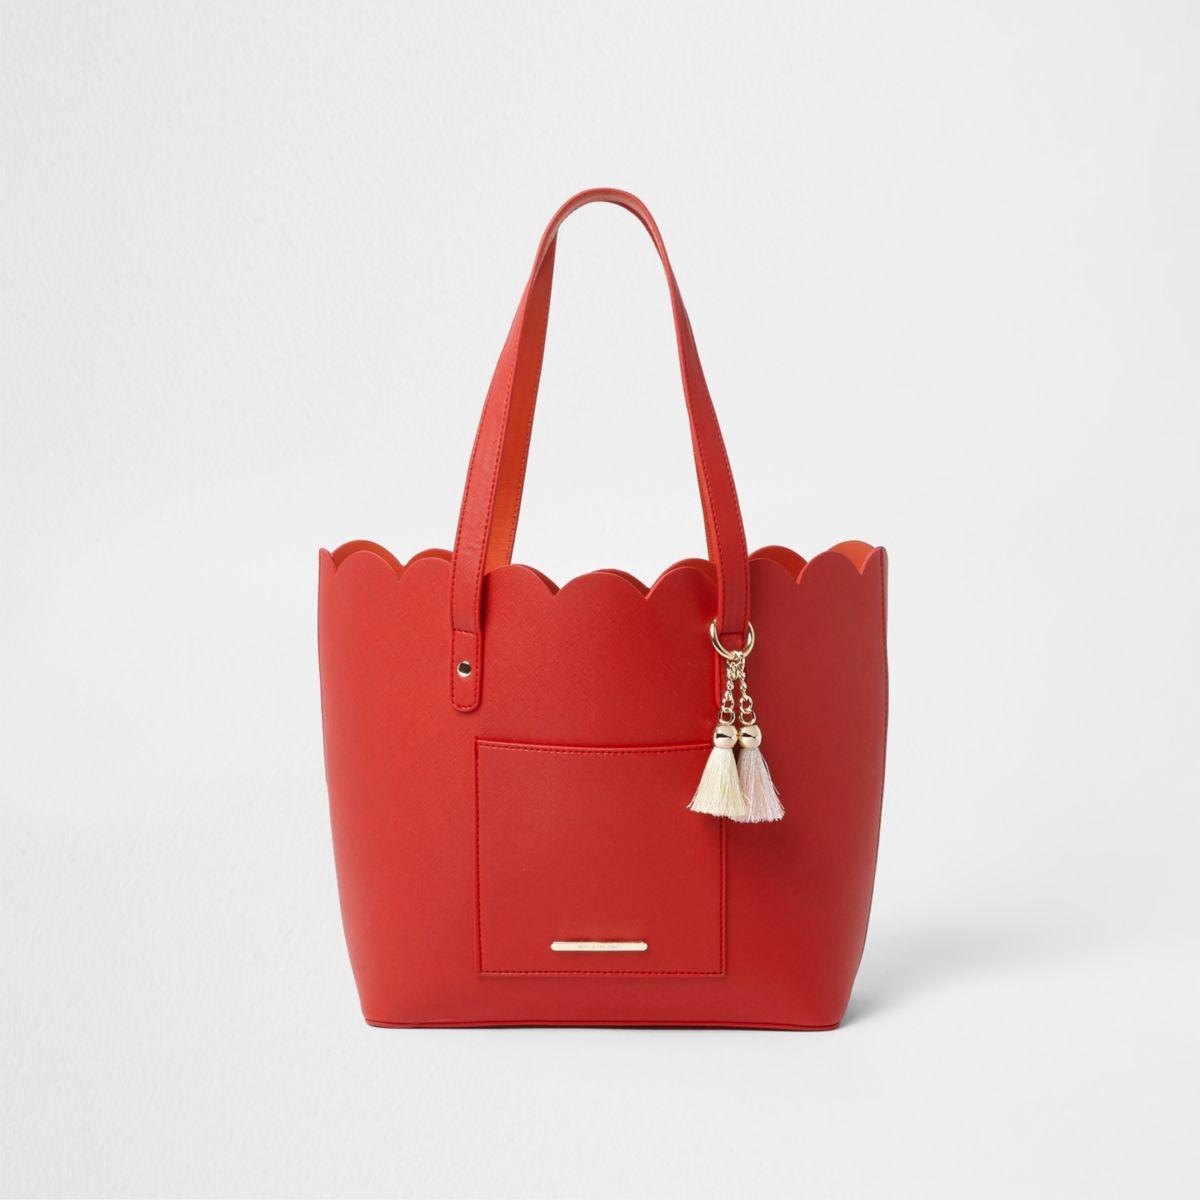 Girls red scallop shopper tote bag